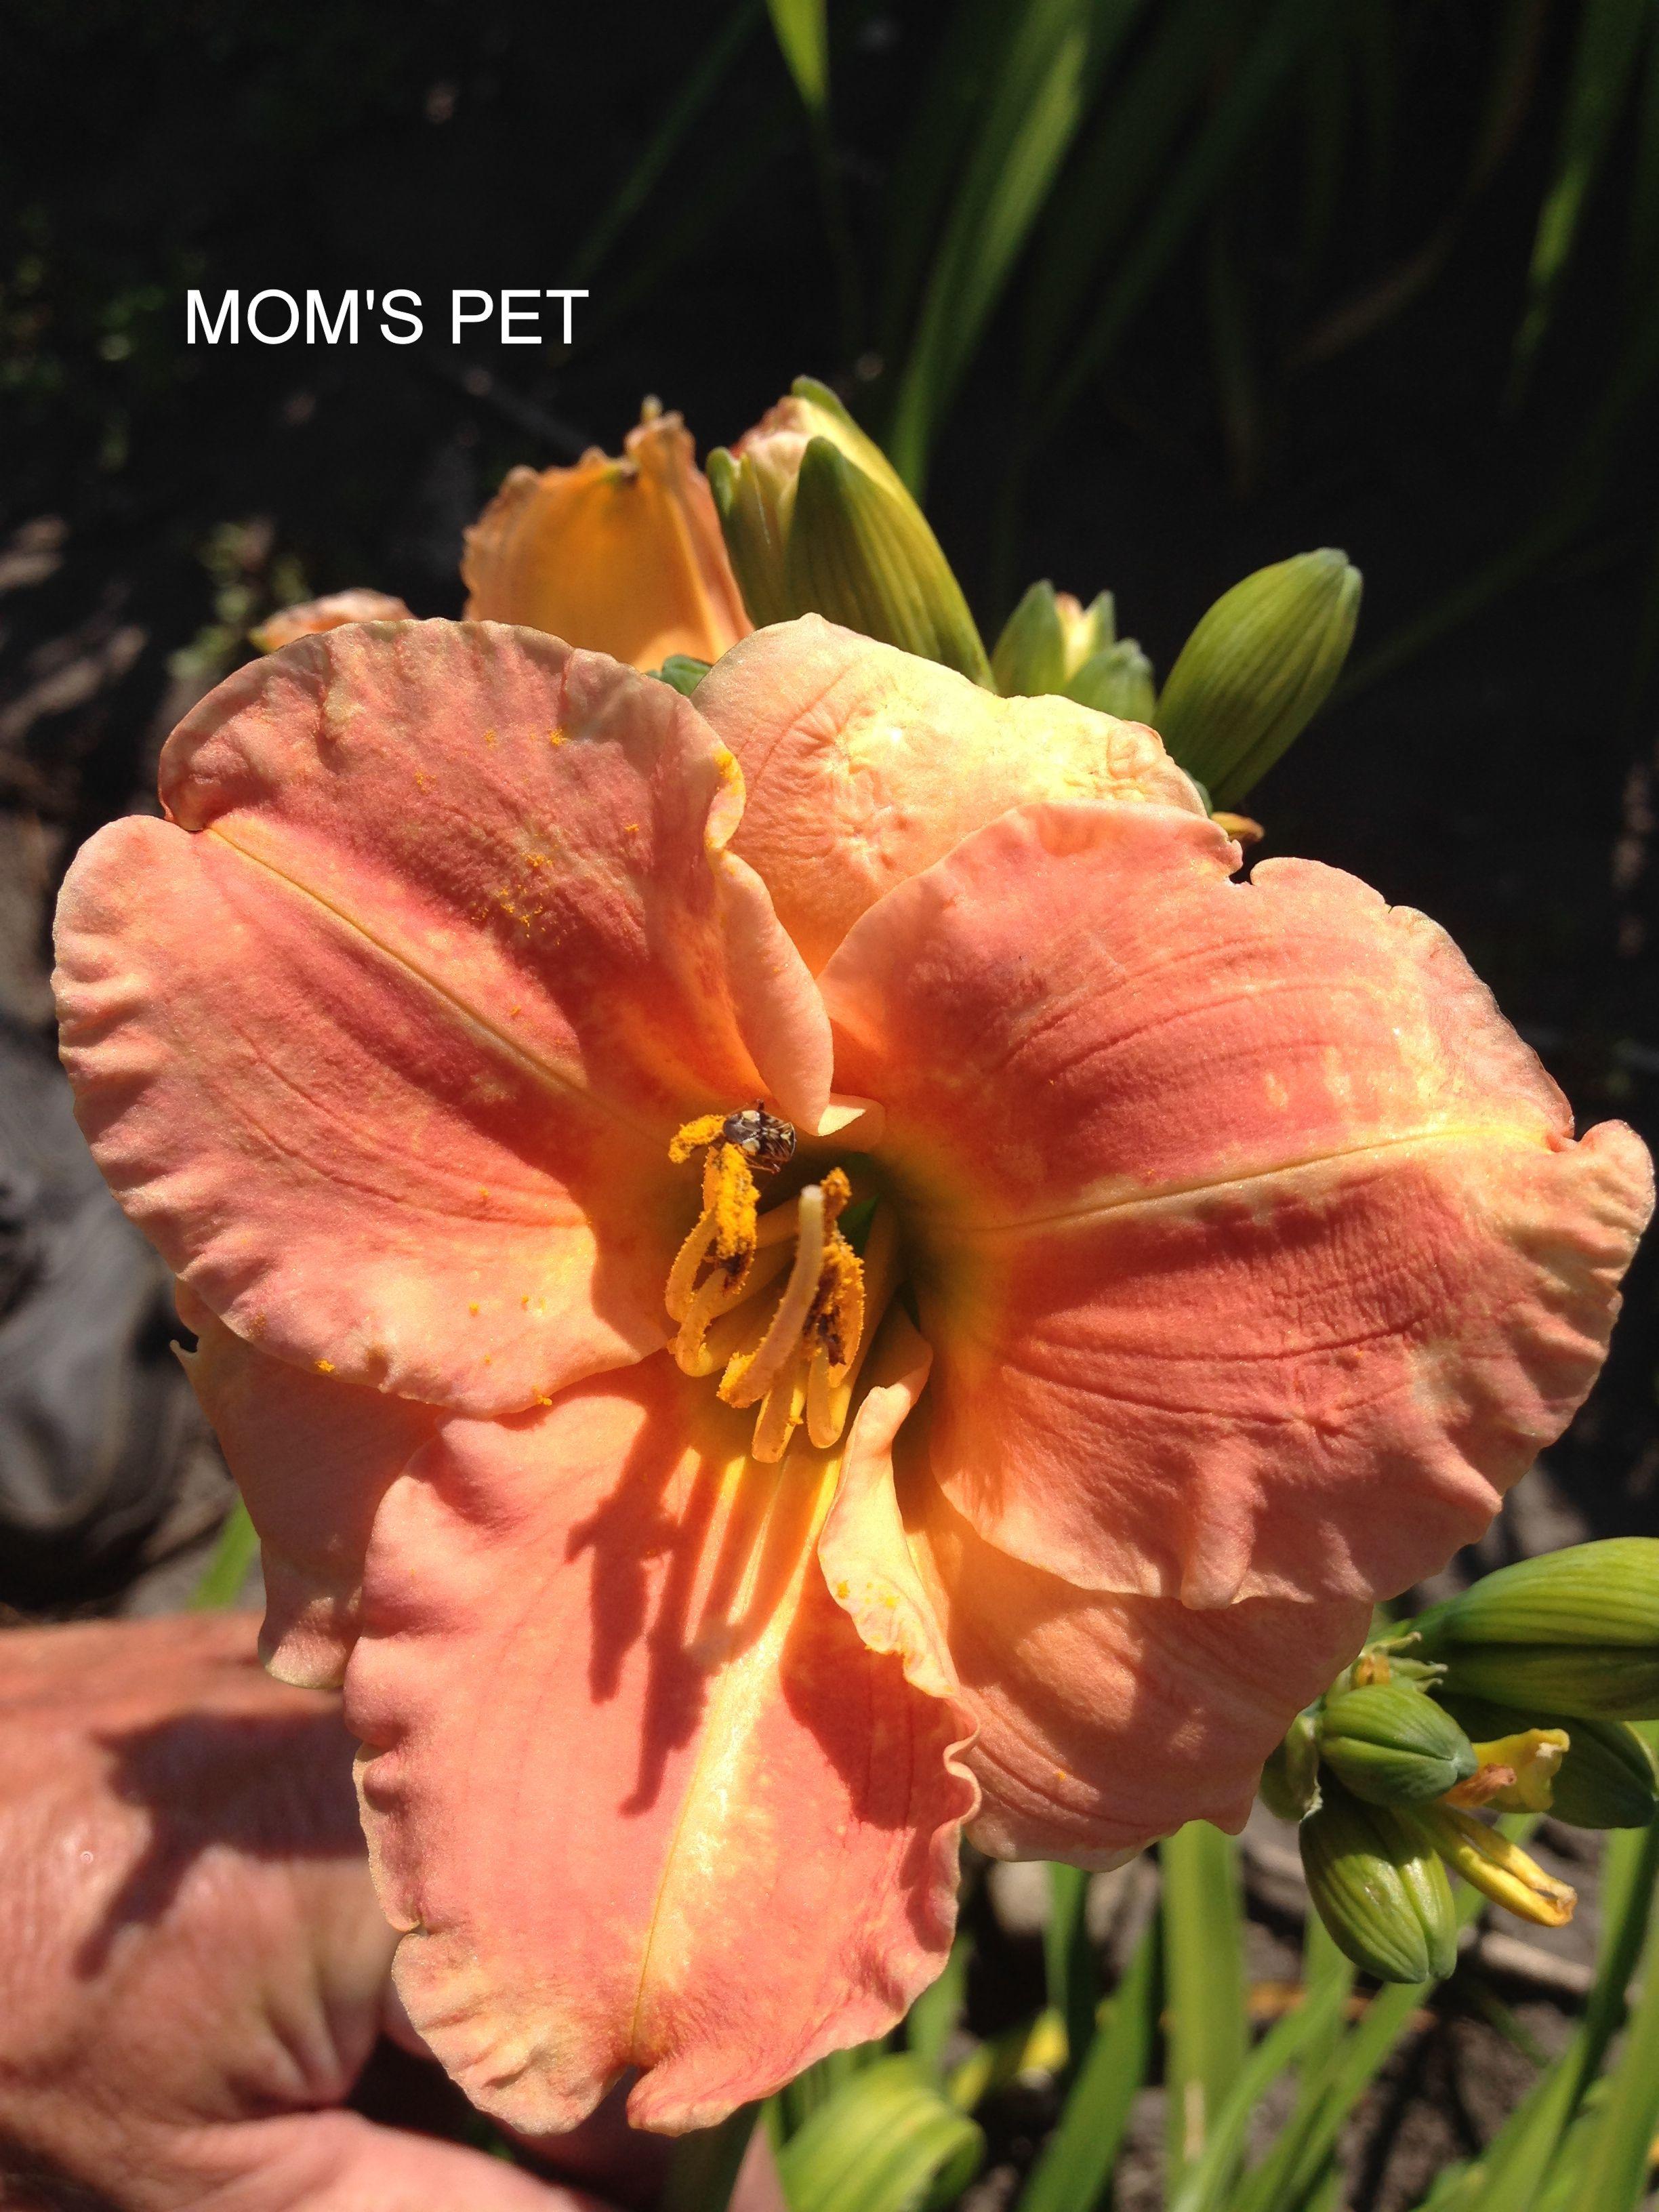 MOM'S PET